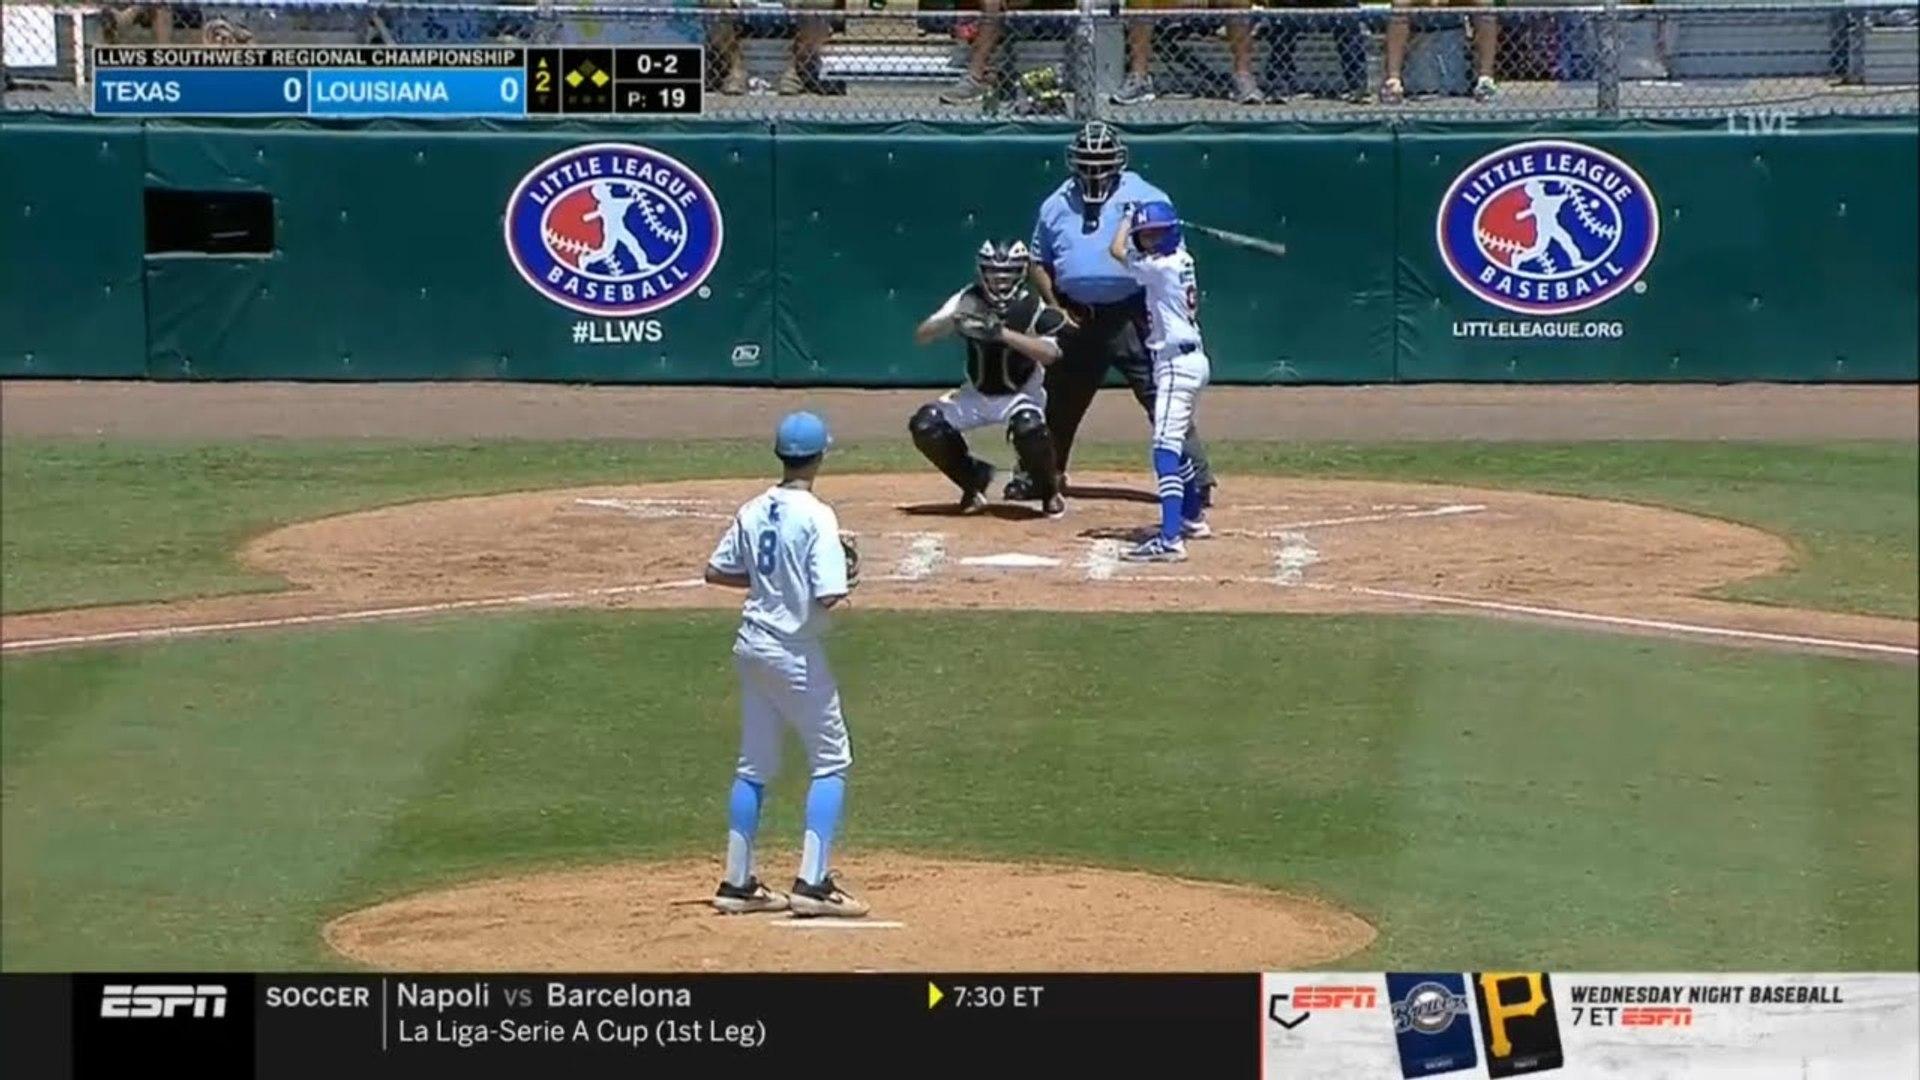 Little League World Series 2019 Southwest Regional Championship -Texas vs Louisiana- LLWS Highlights